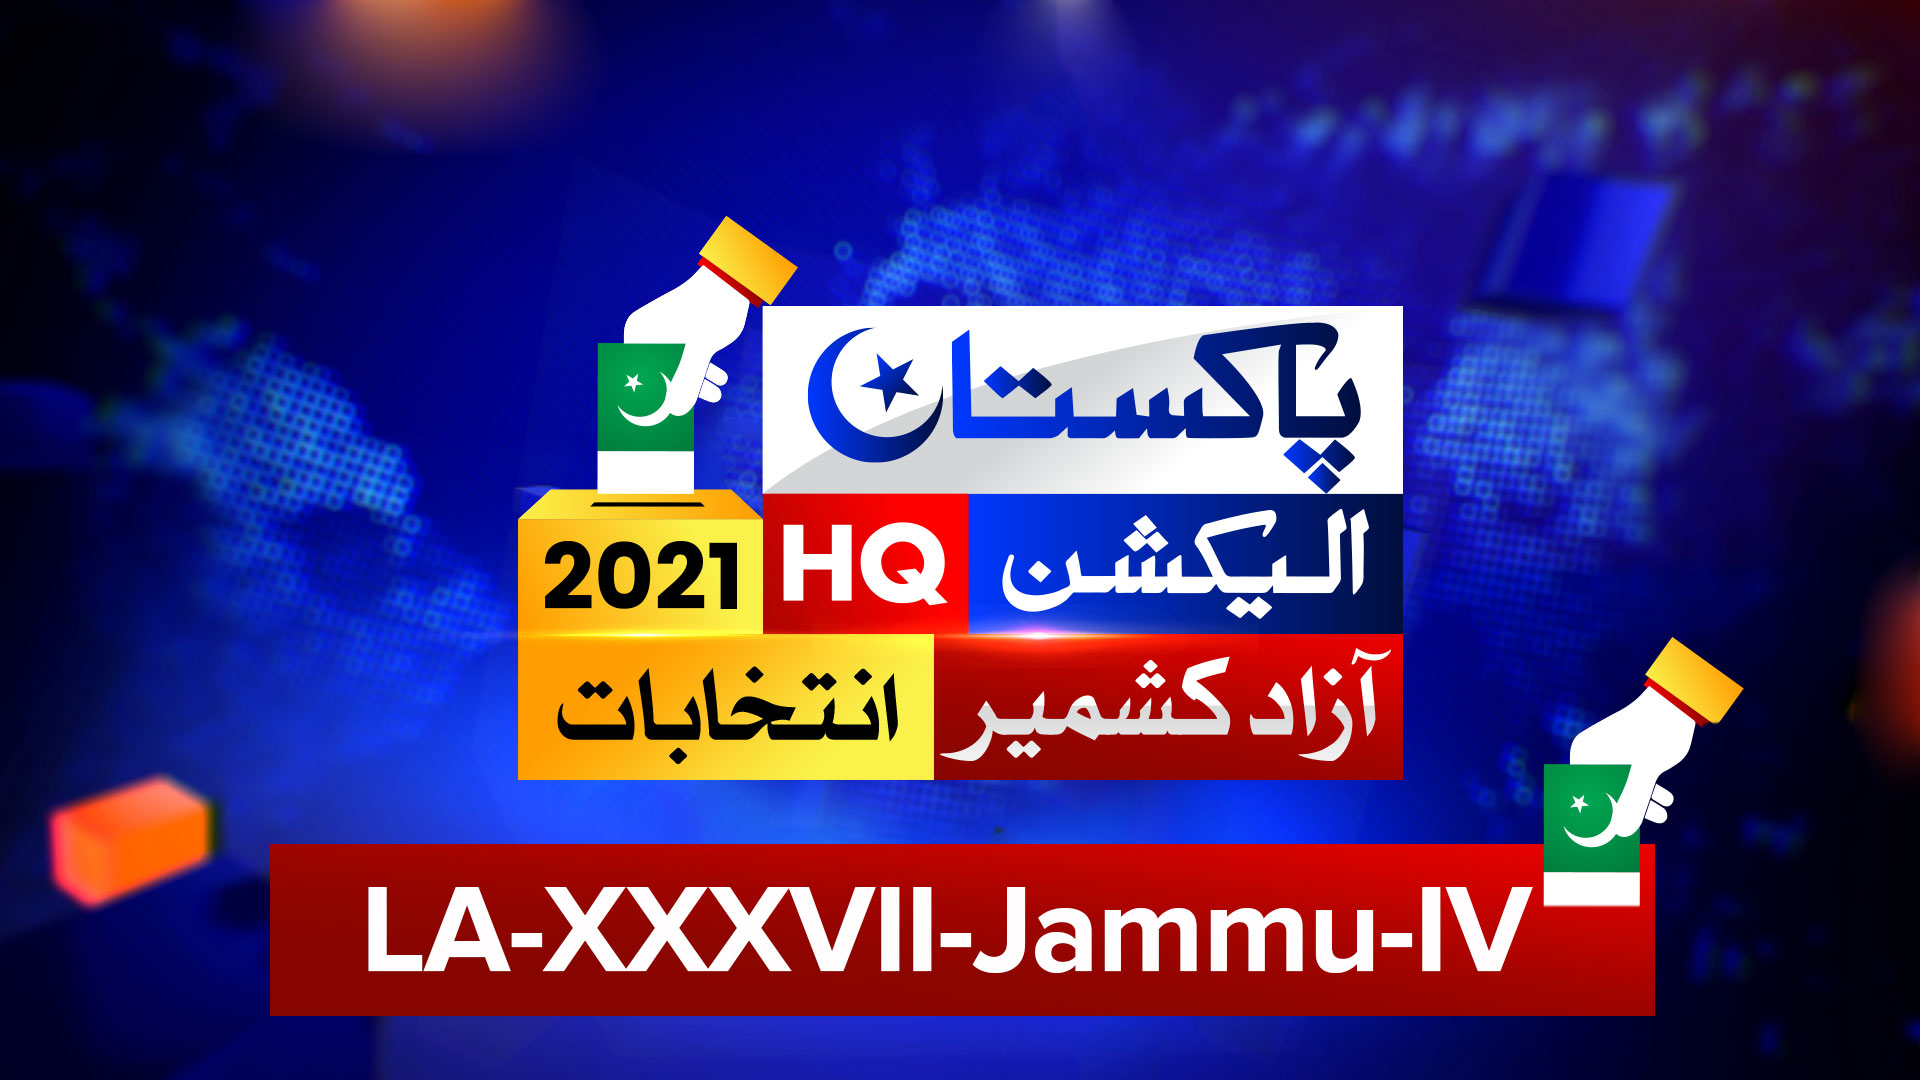 LA-XXXVII-Jammu-IV